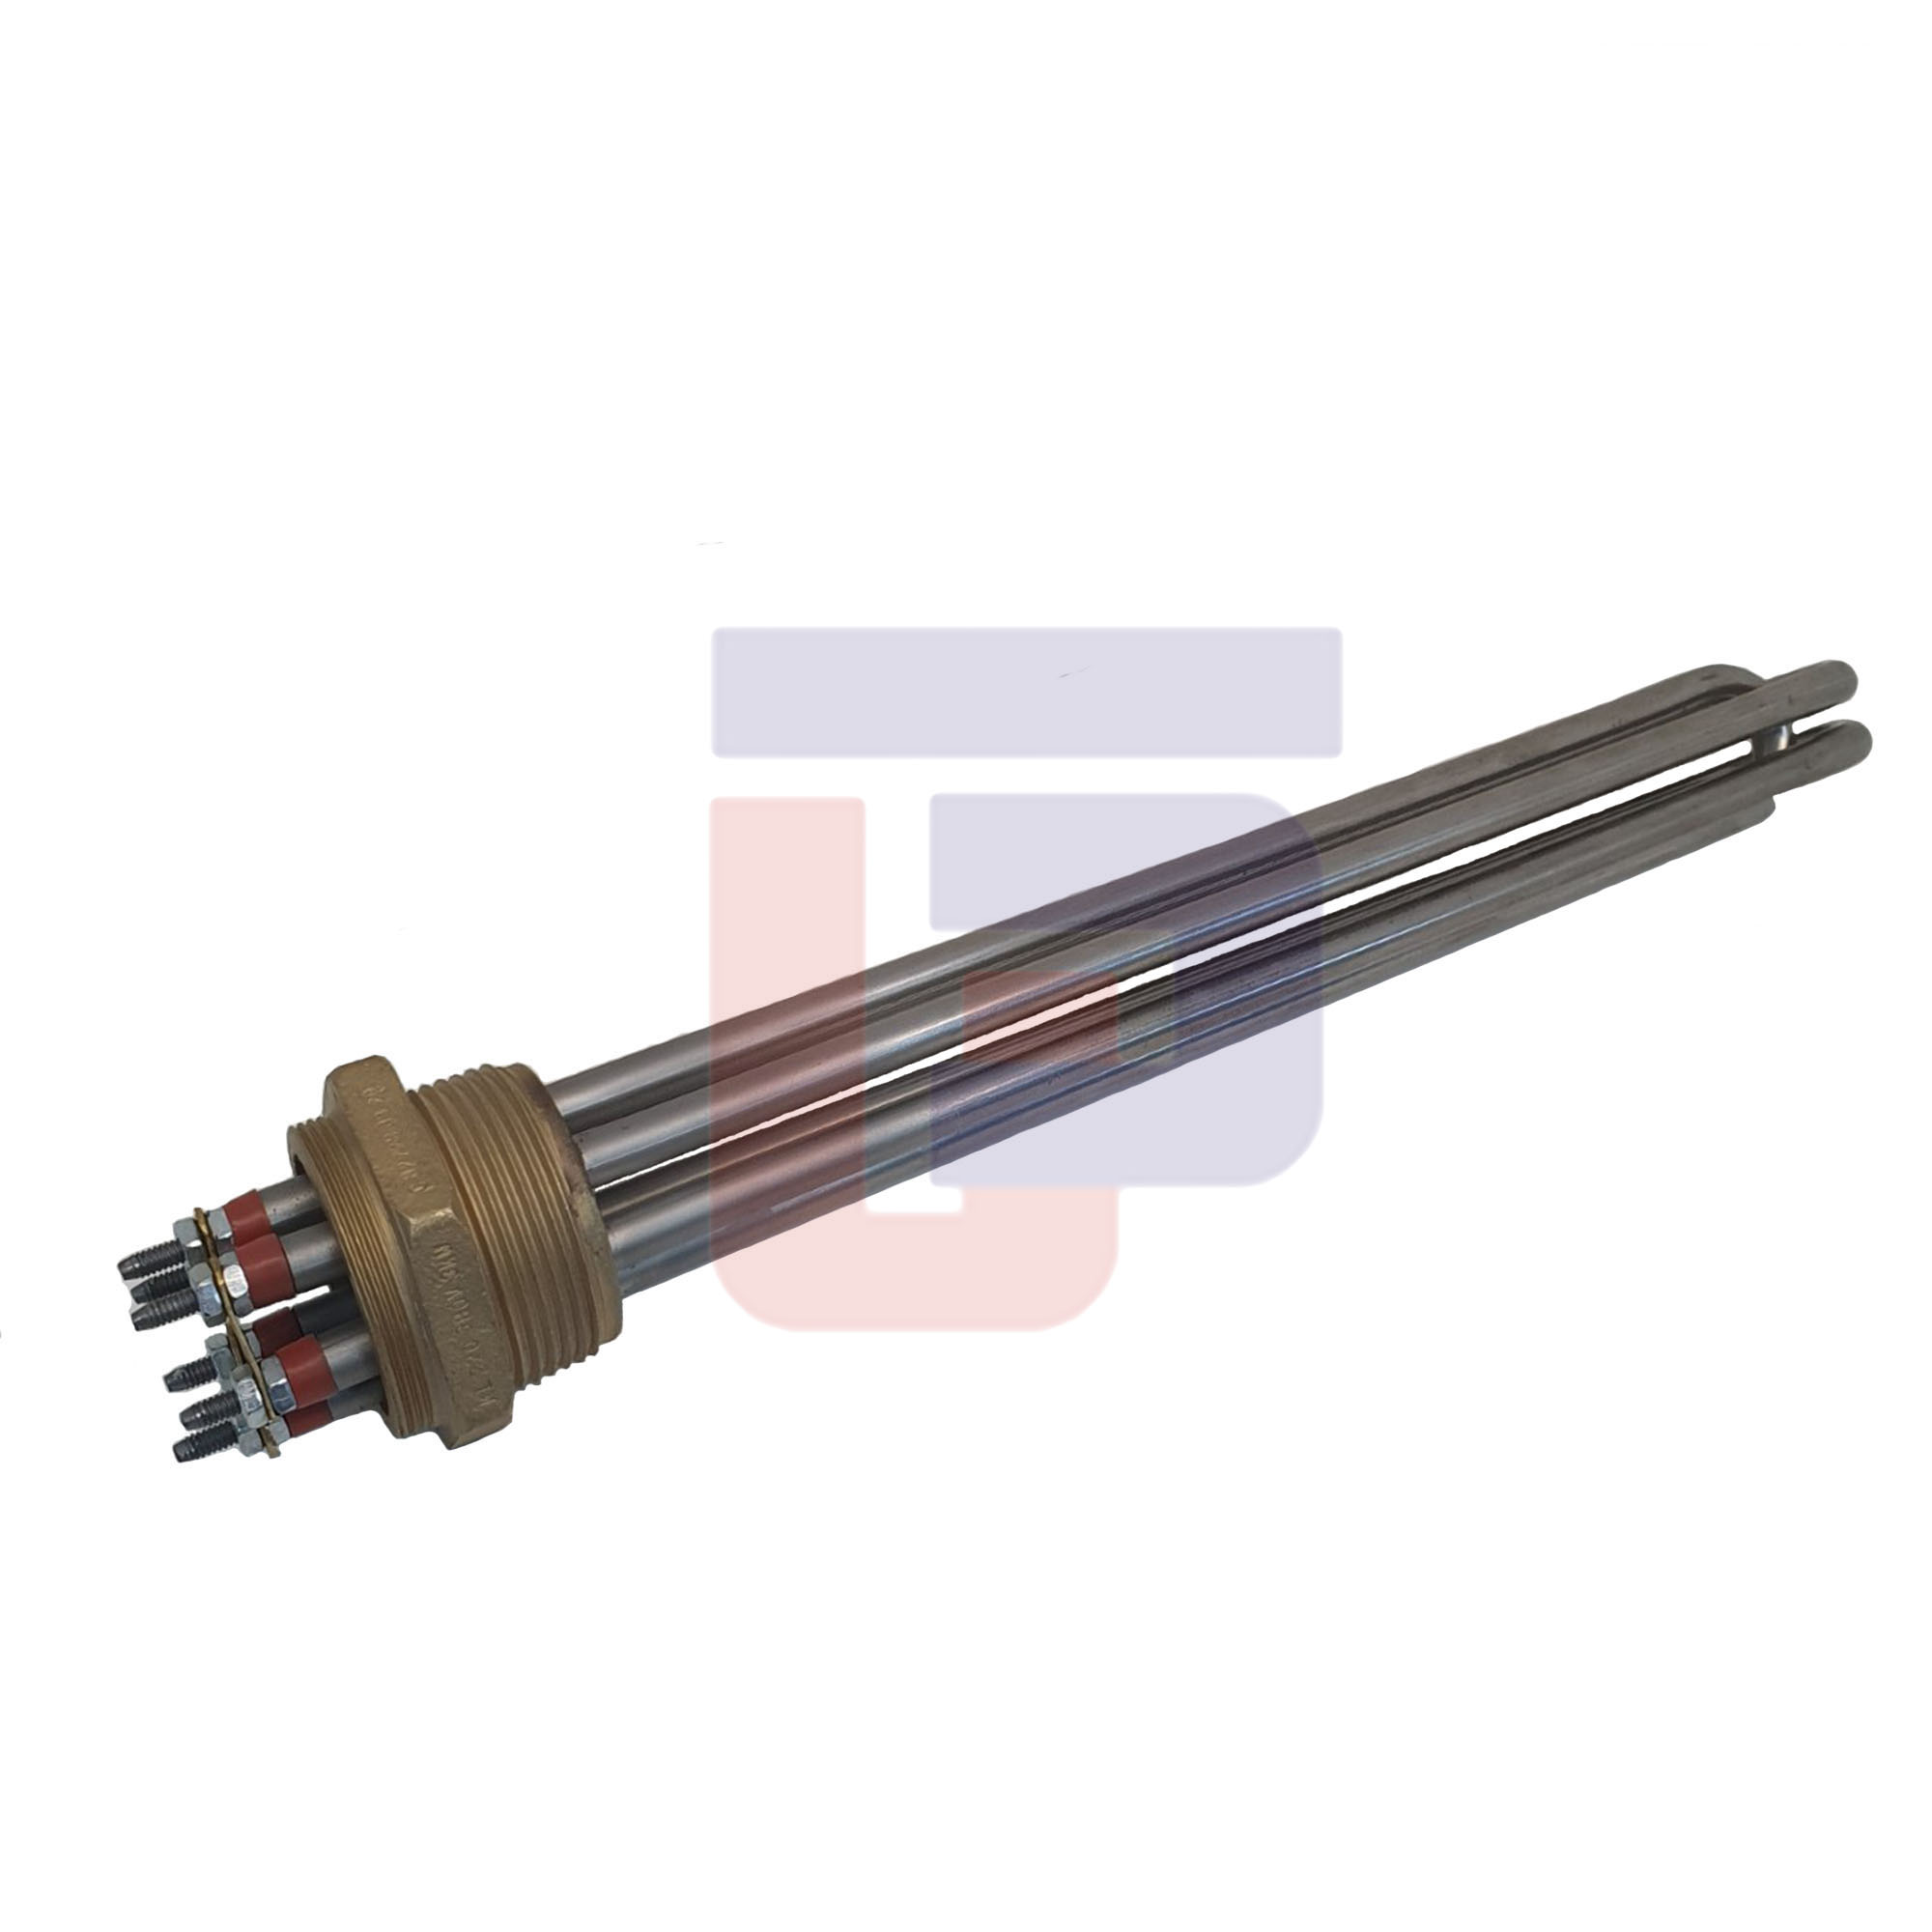 "Resistência Elétrica Rosca 1.1/2""BSP 300MM 220/380V"